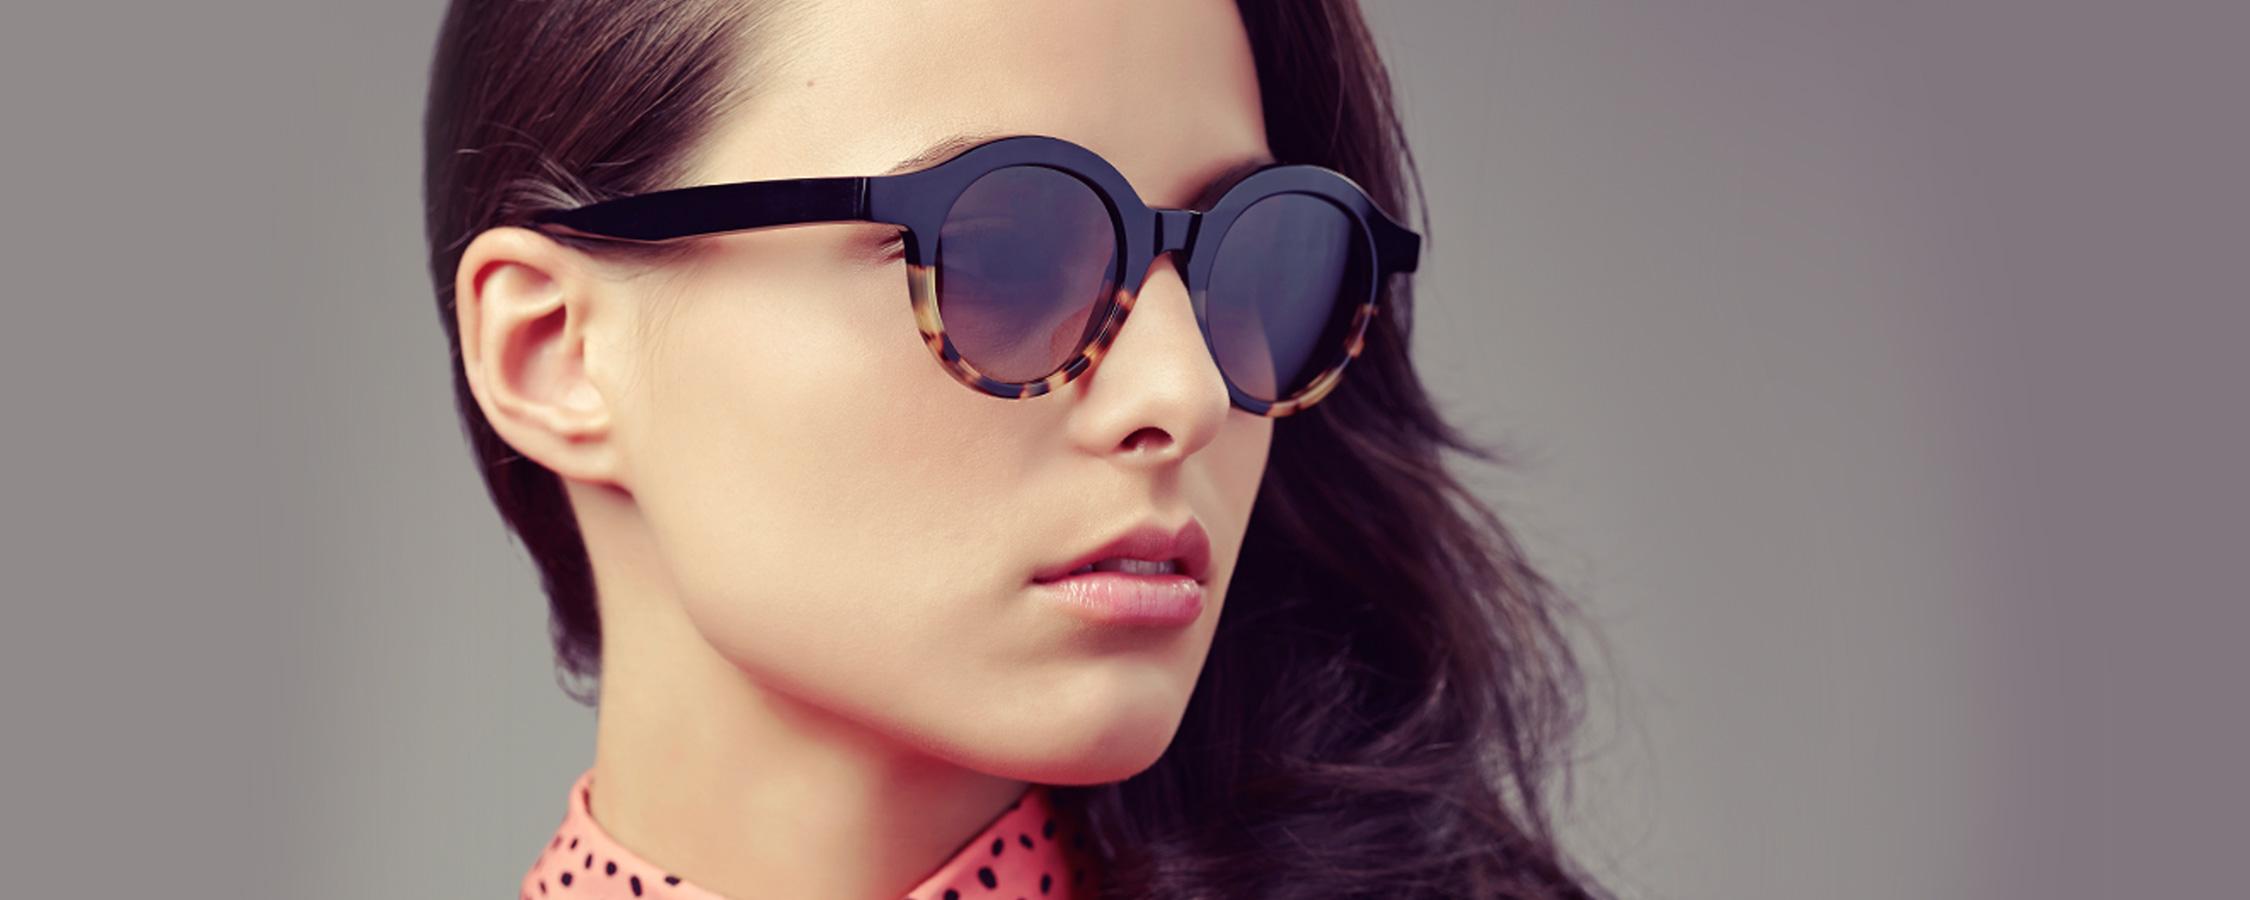 ResRei_Sunglasses.jpg